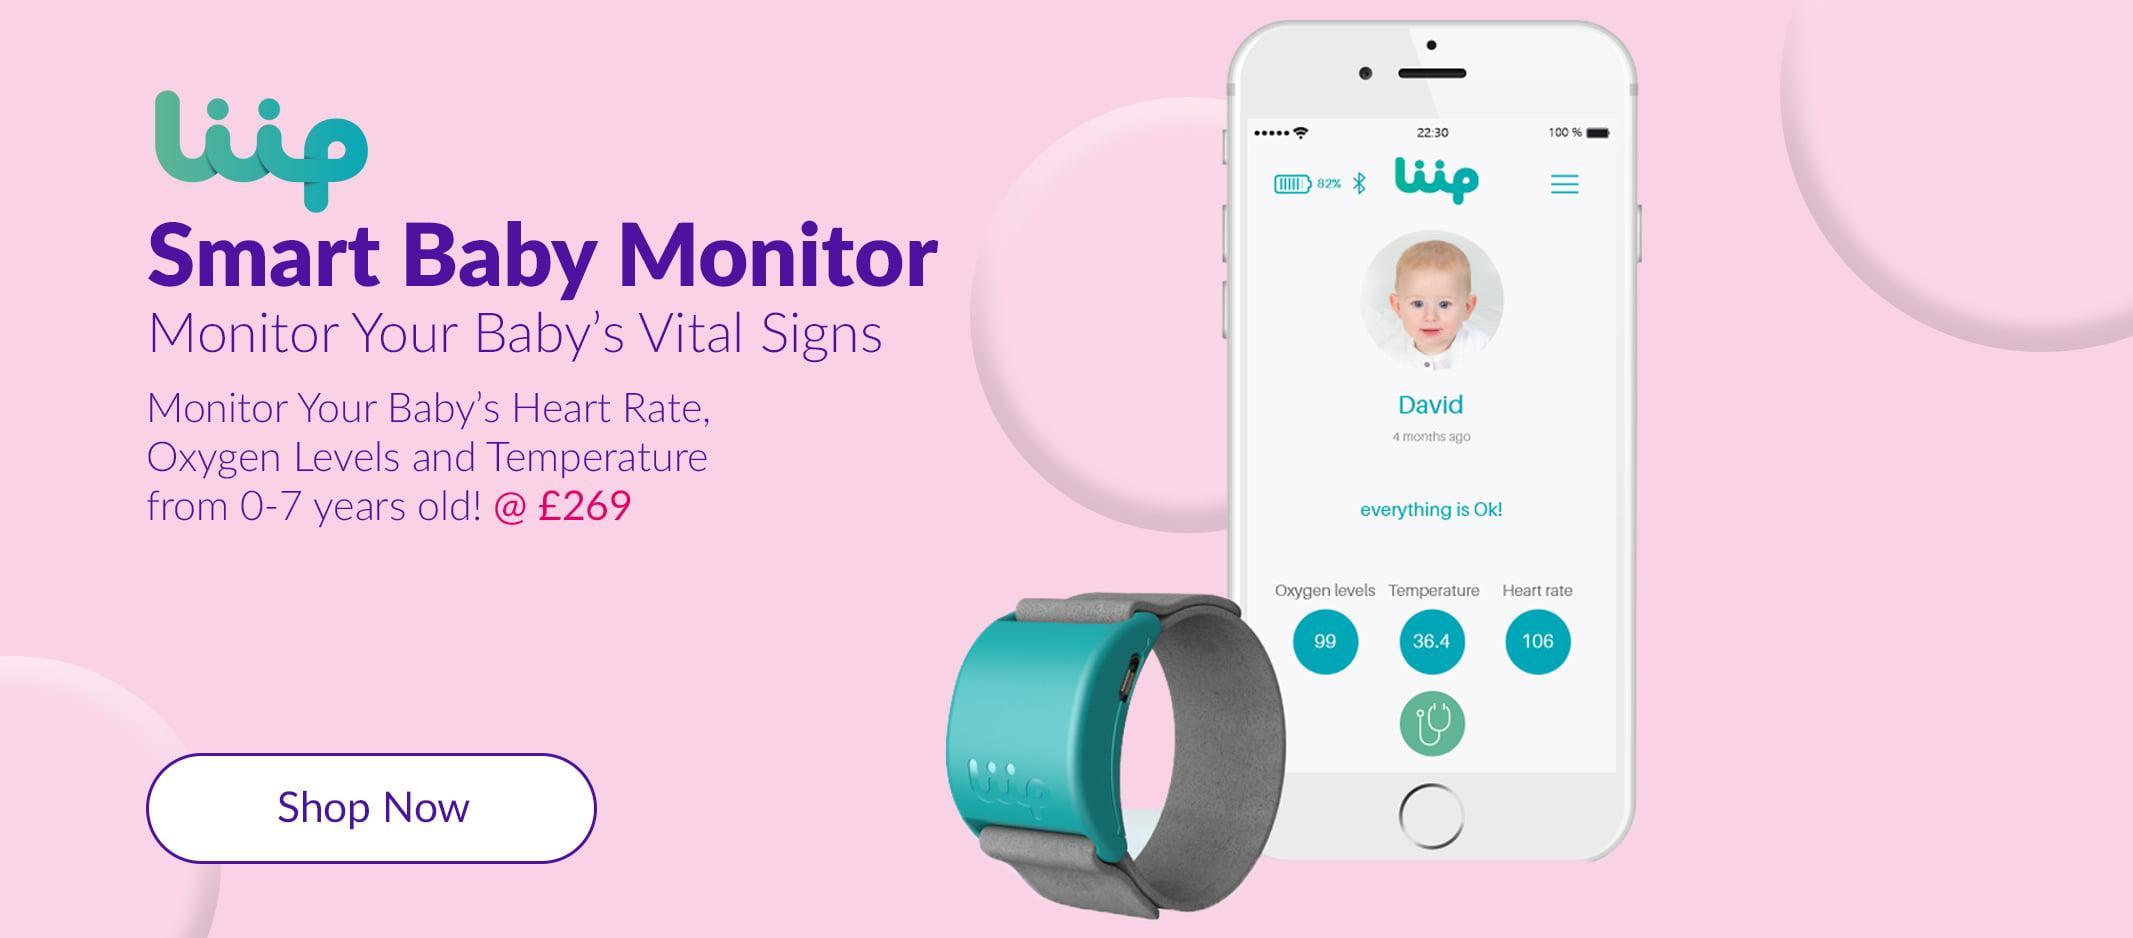 Liip Baby Monitor